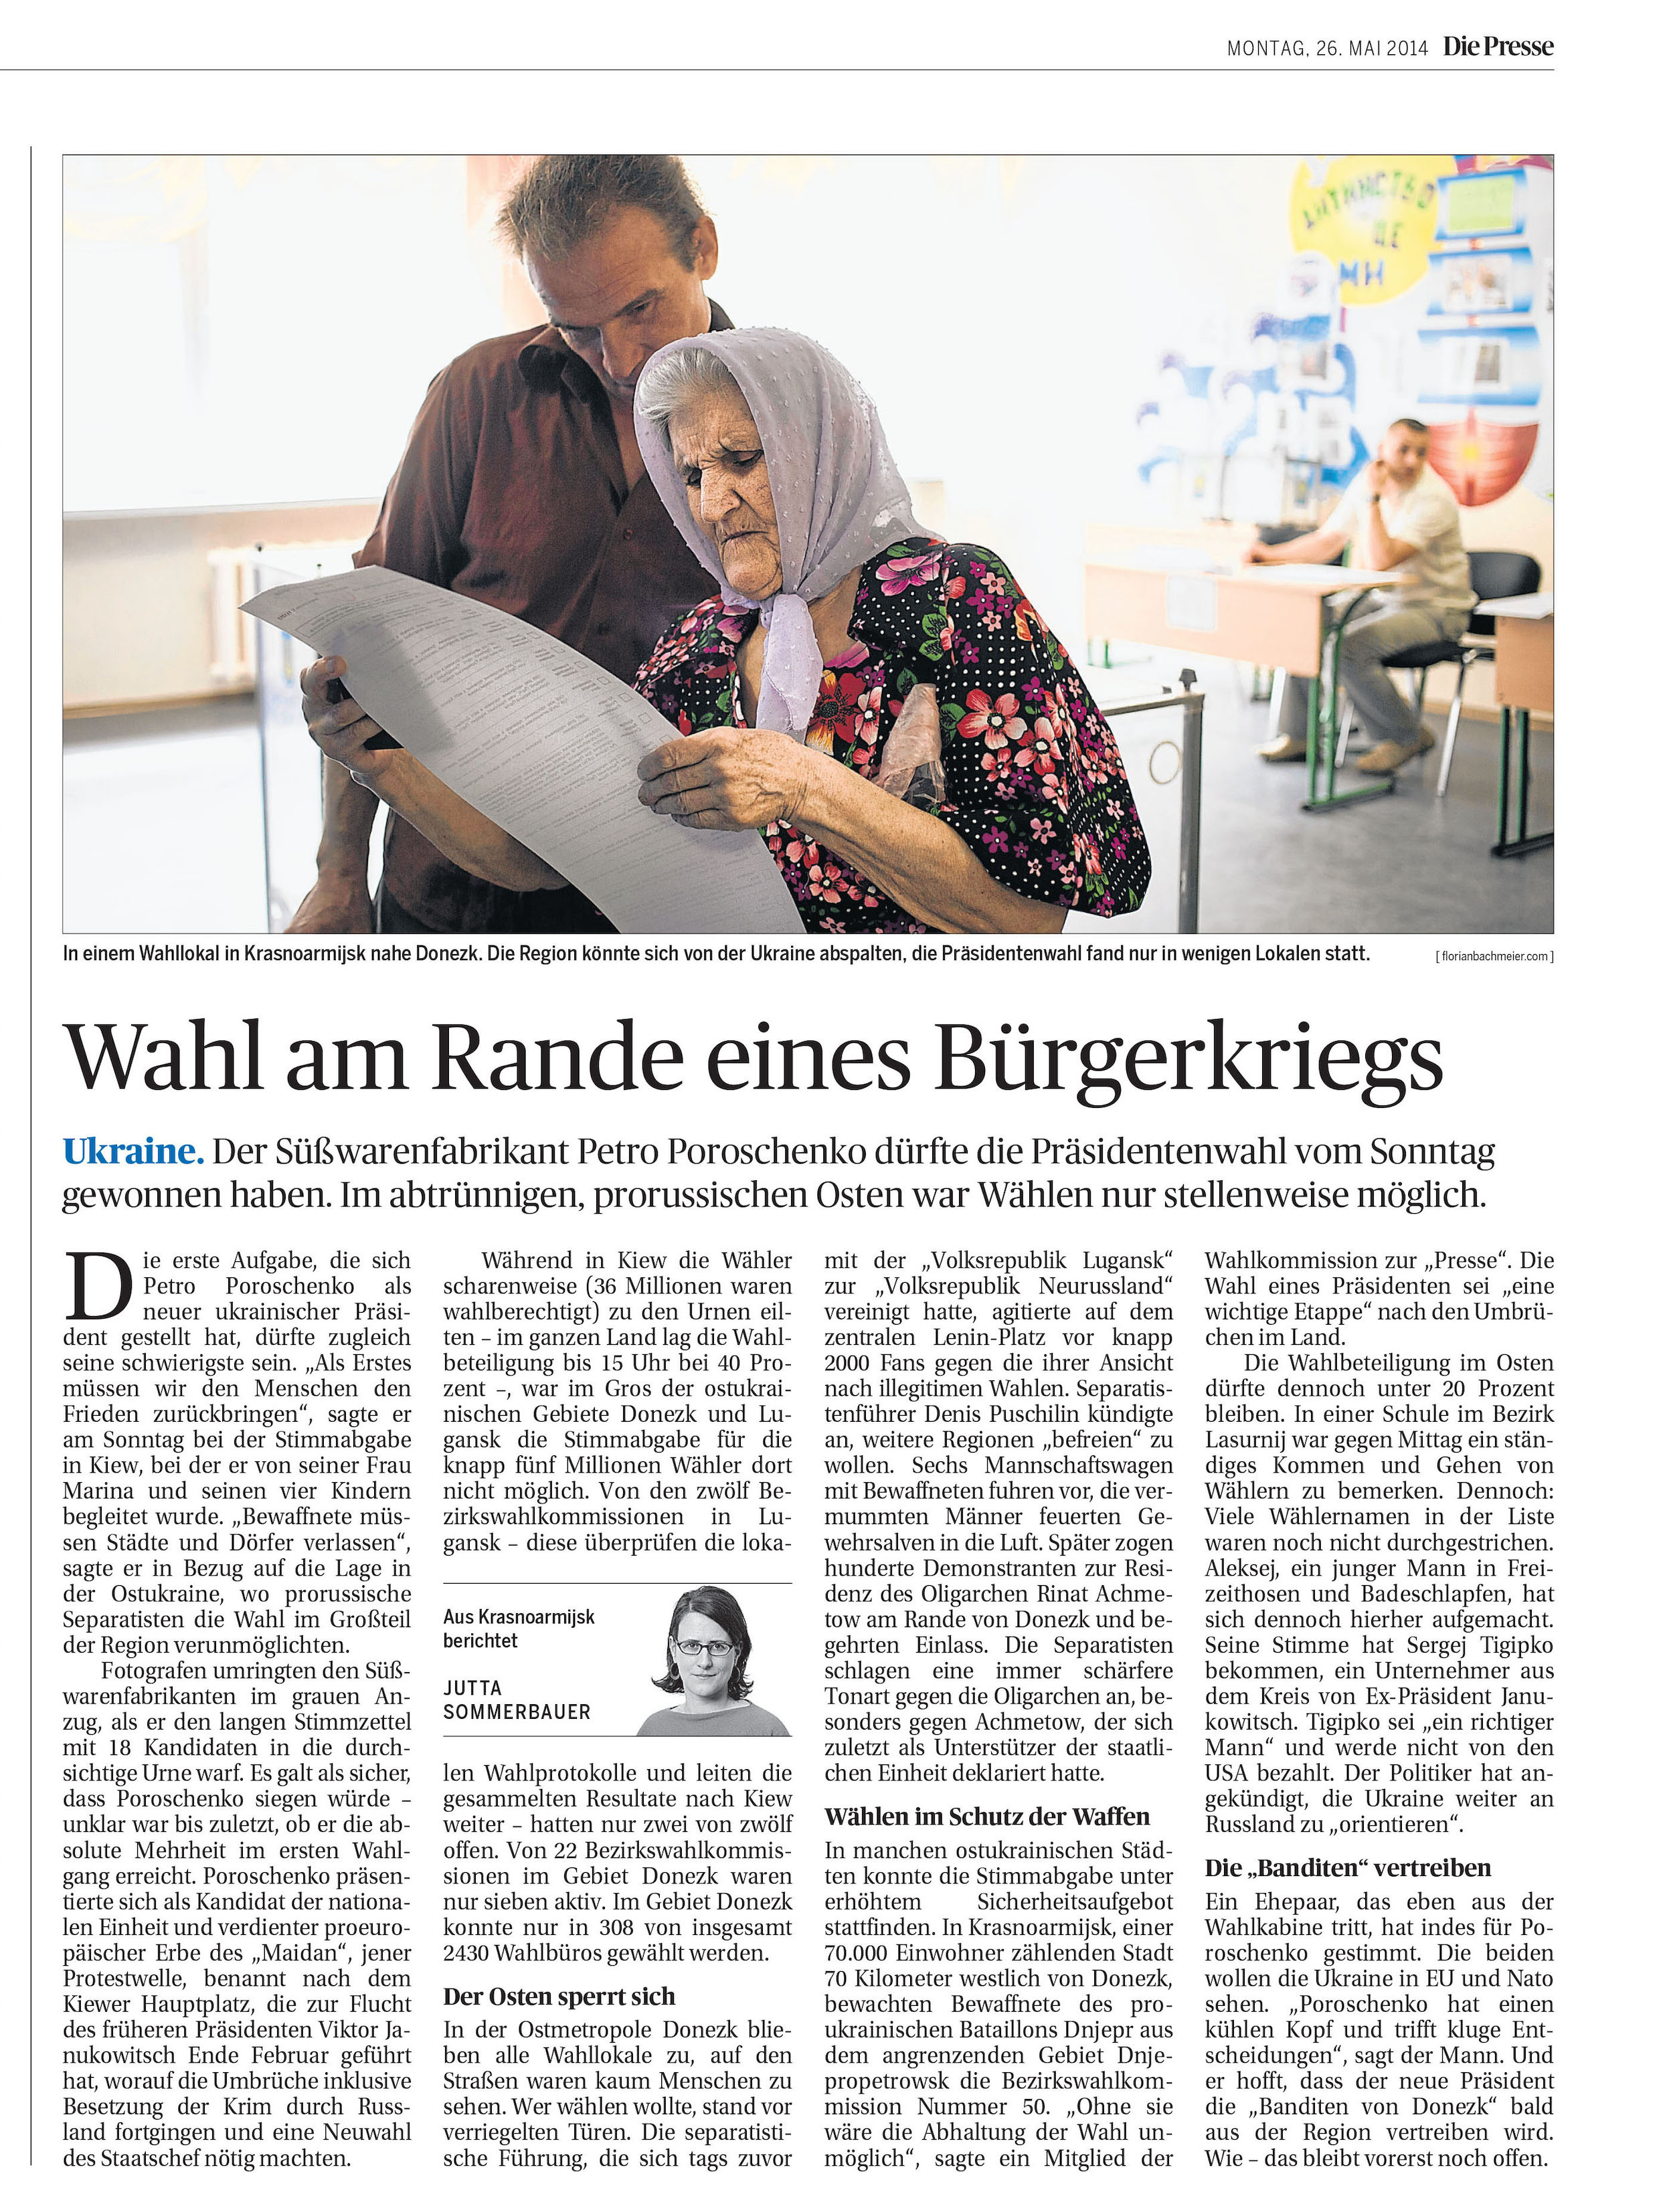 Die Presse, 26. Mai 2014